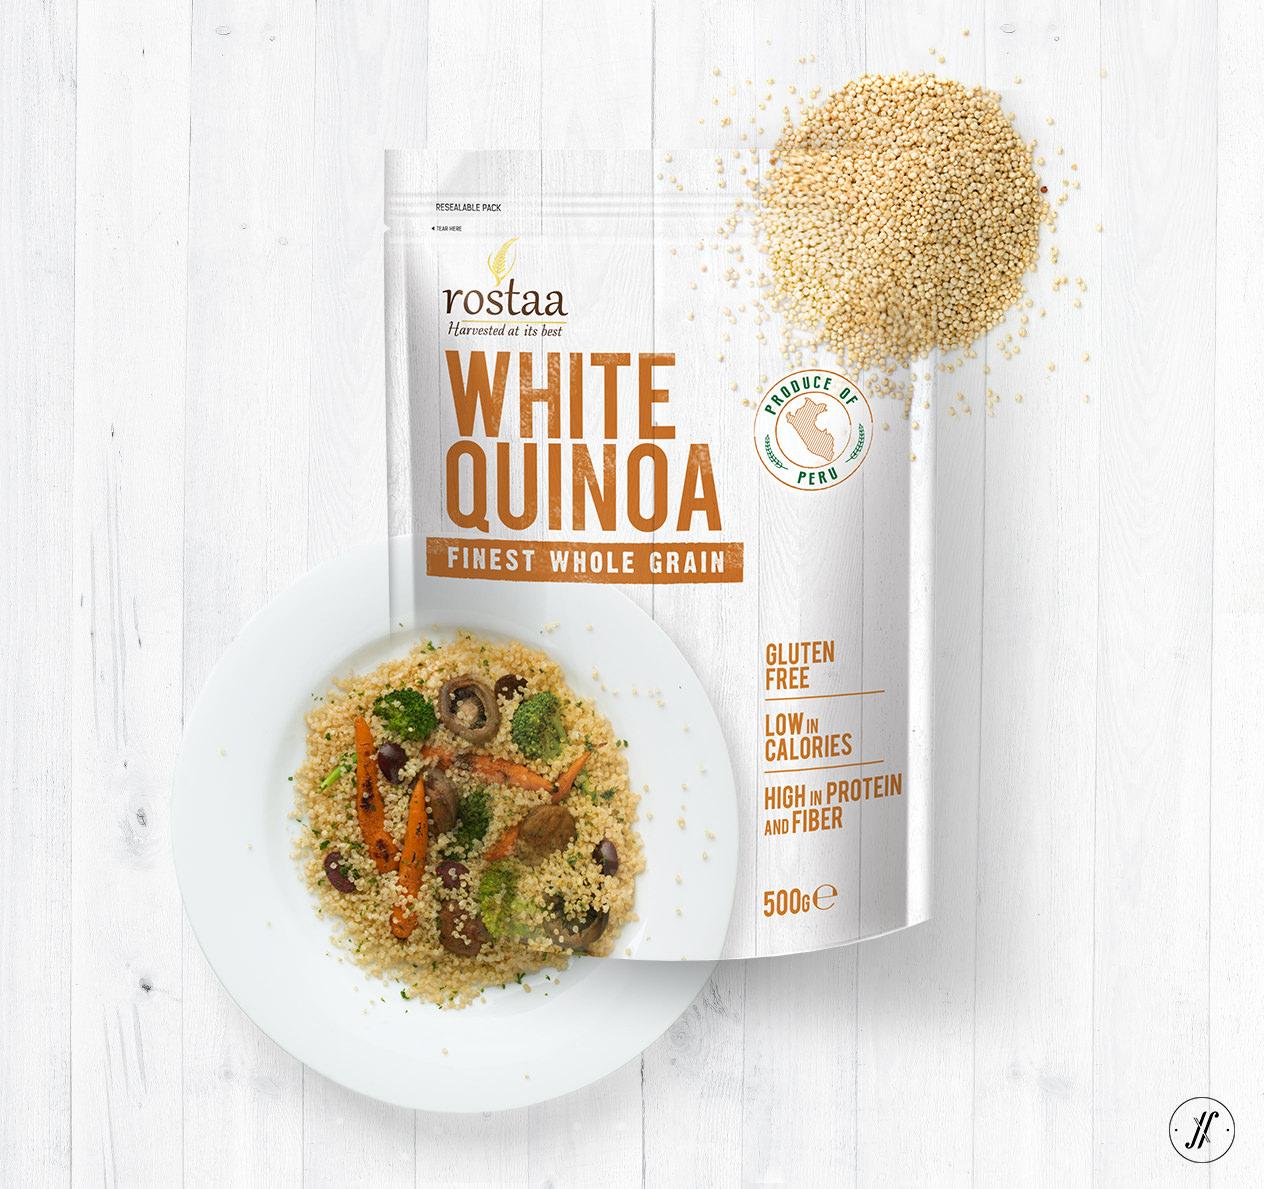 Yellow-Fishes-Best-Branding-Agency-Mumbai-India-Packaging-Design-Agency-Rostaa-Pacakging-Case-Study-White-Quinoa-Design